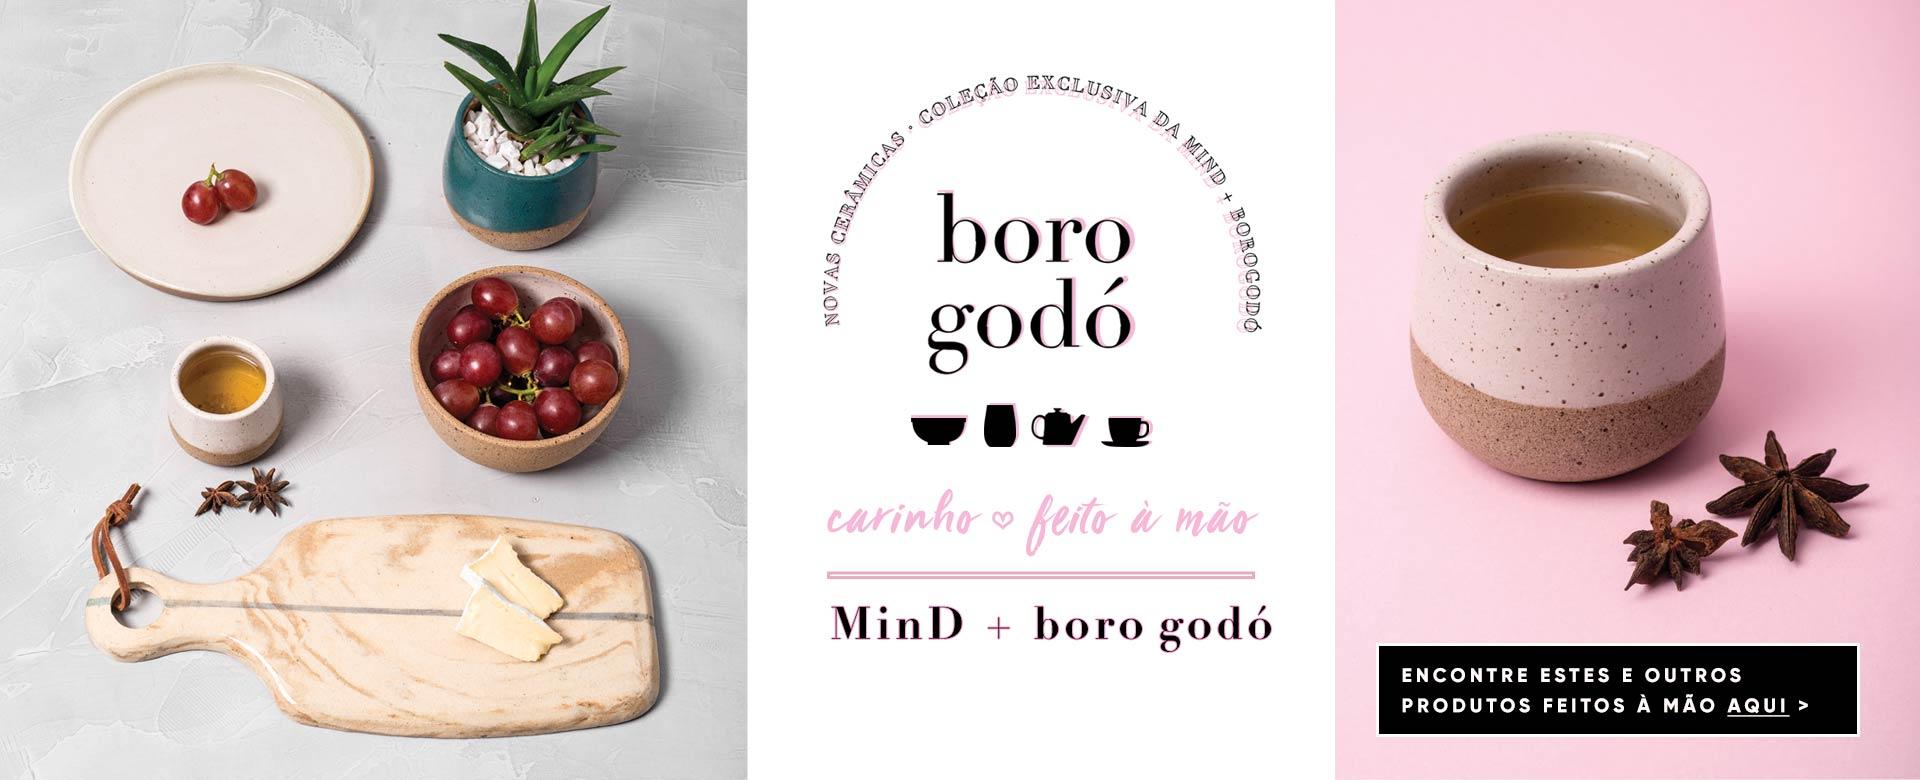 A - BOROGODO